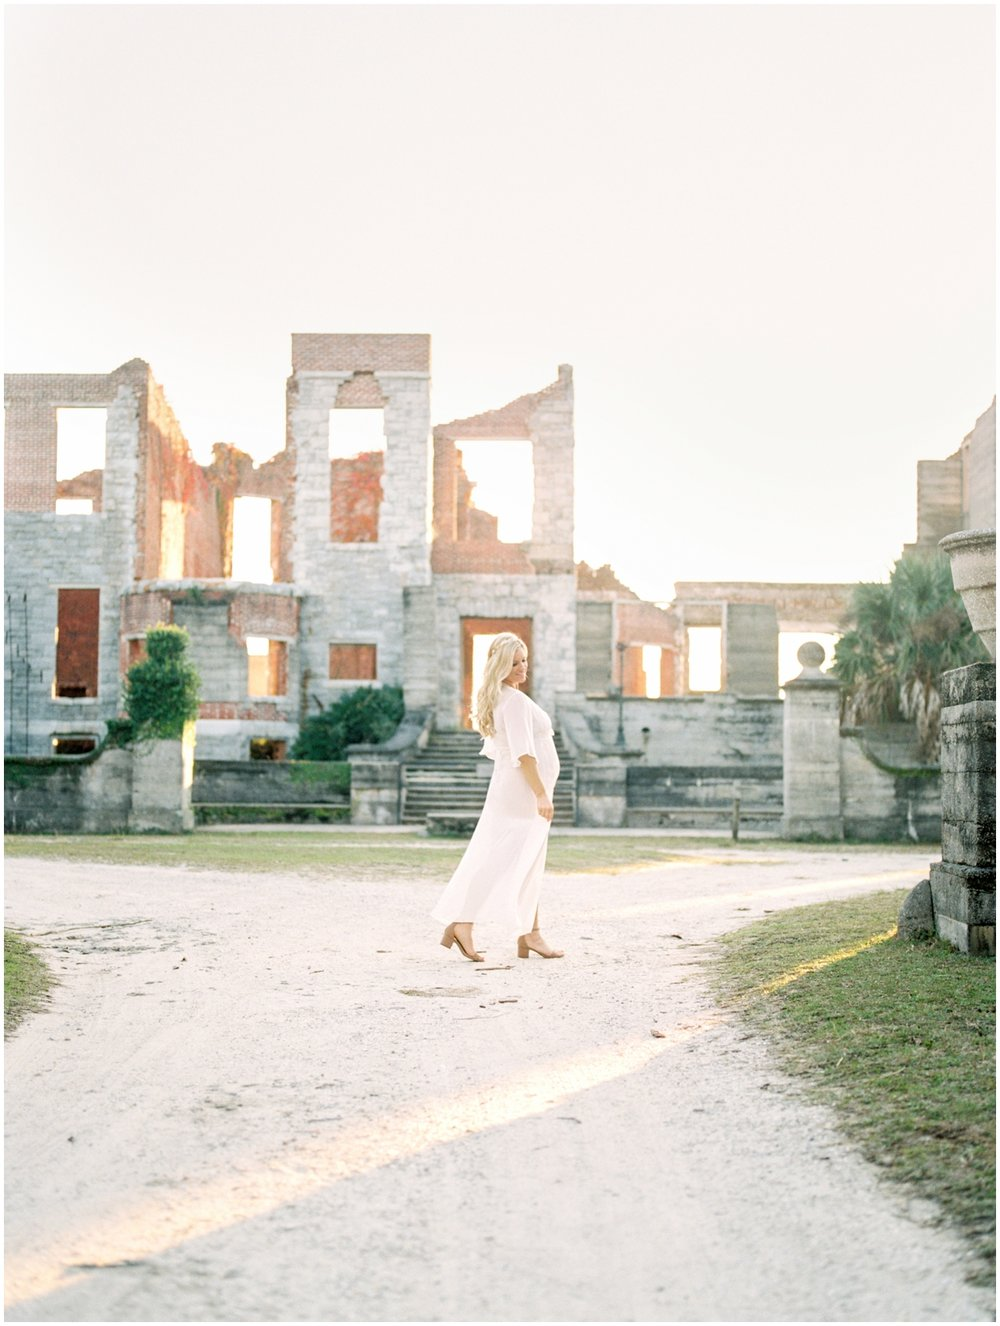 Lisa Silva Photography -Maternity Session at Cumberland Island, Georgia - Jacksonville and North East Florida Fine Art Film Photographer_0028.jpg